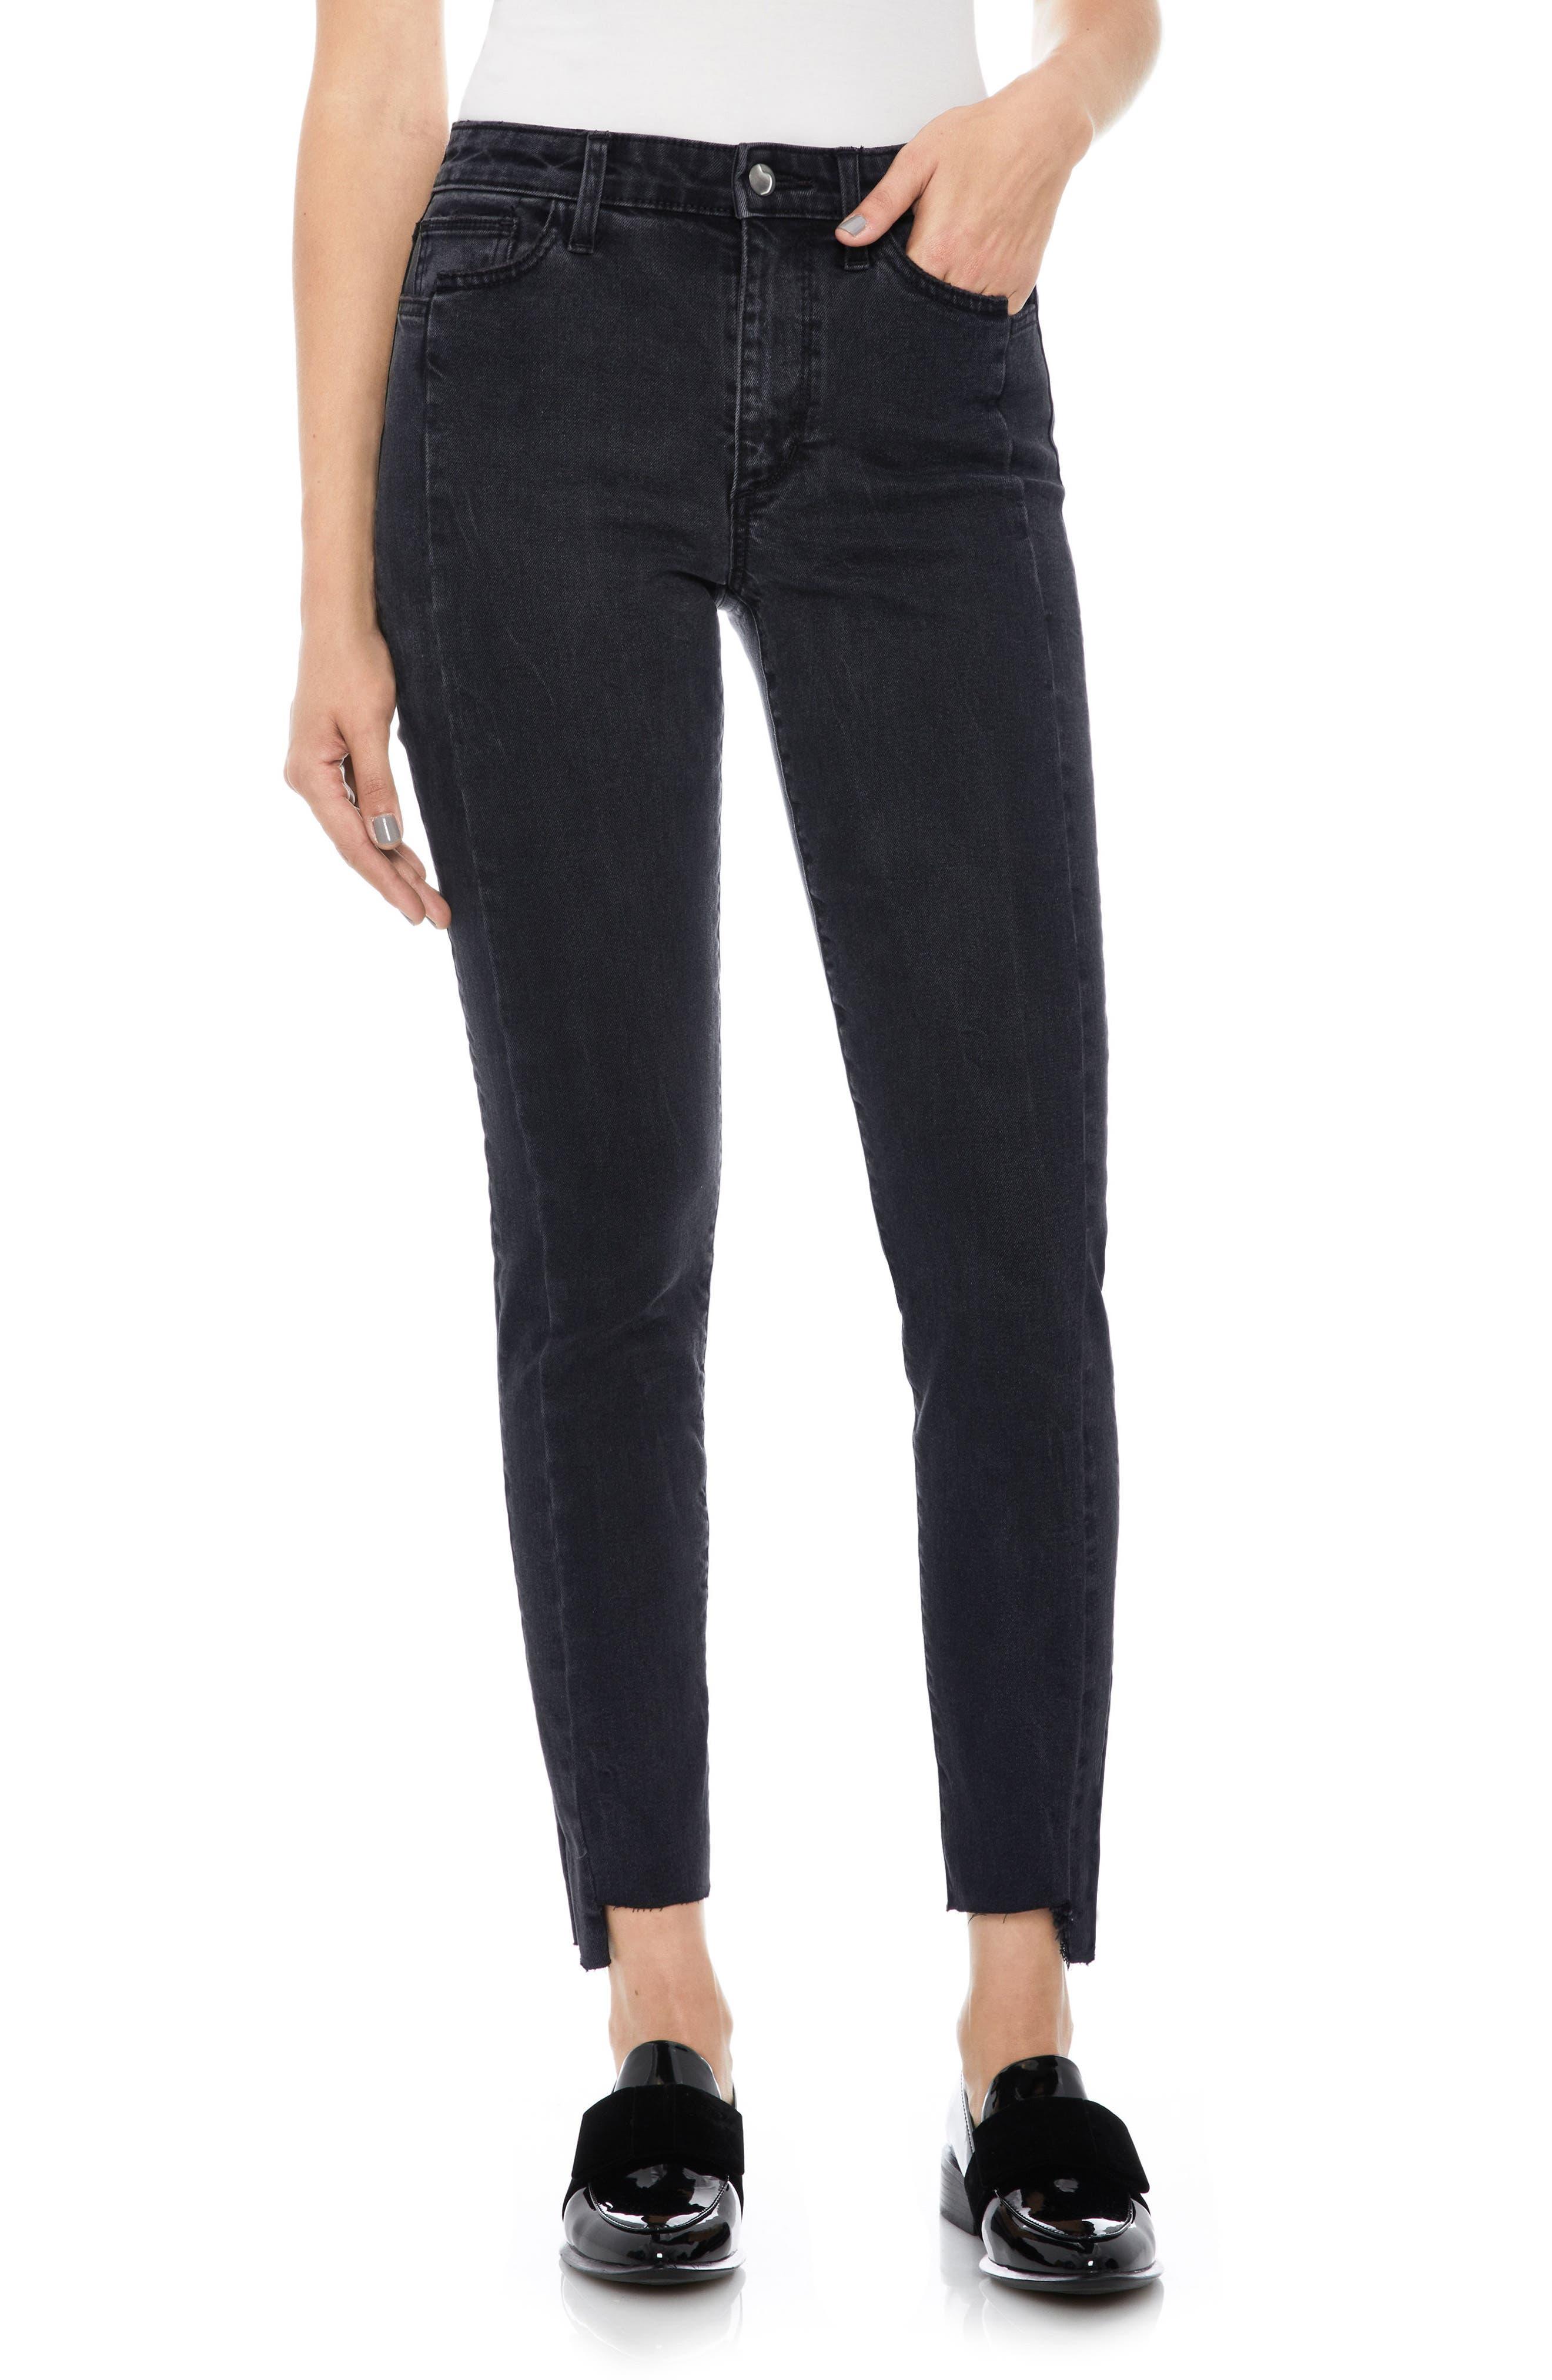 Taylor Hill x Joe's Kass Raw Step Hem Ankle Skinny Jeans,                         Main,                         color, 011